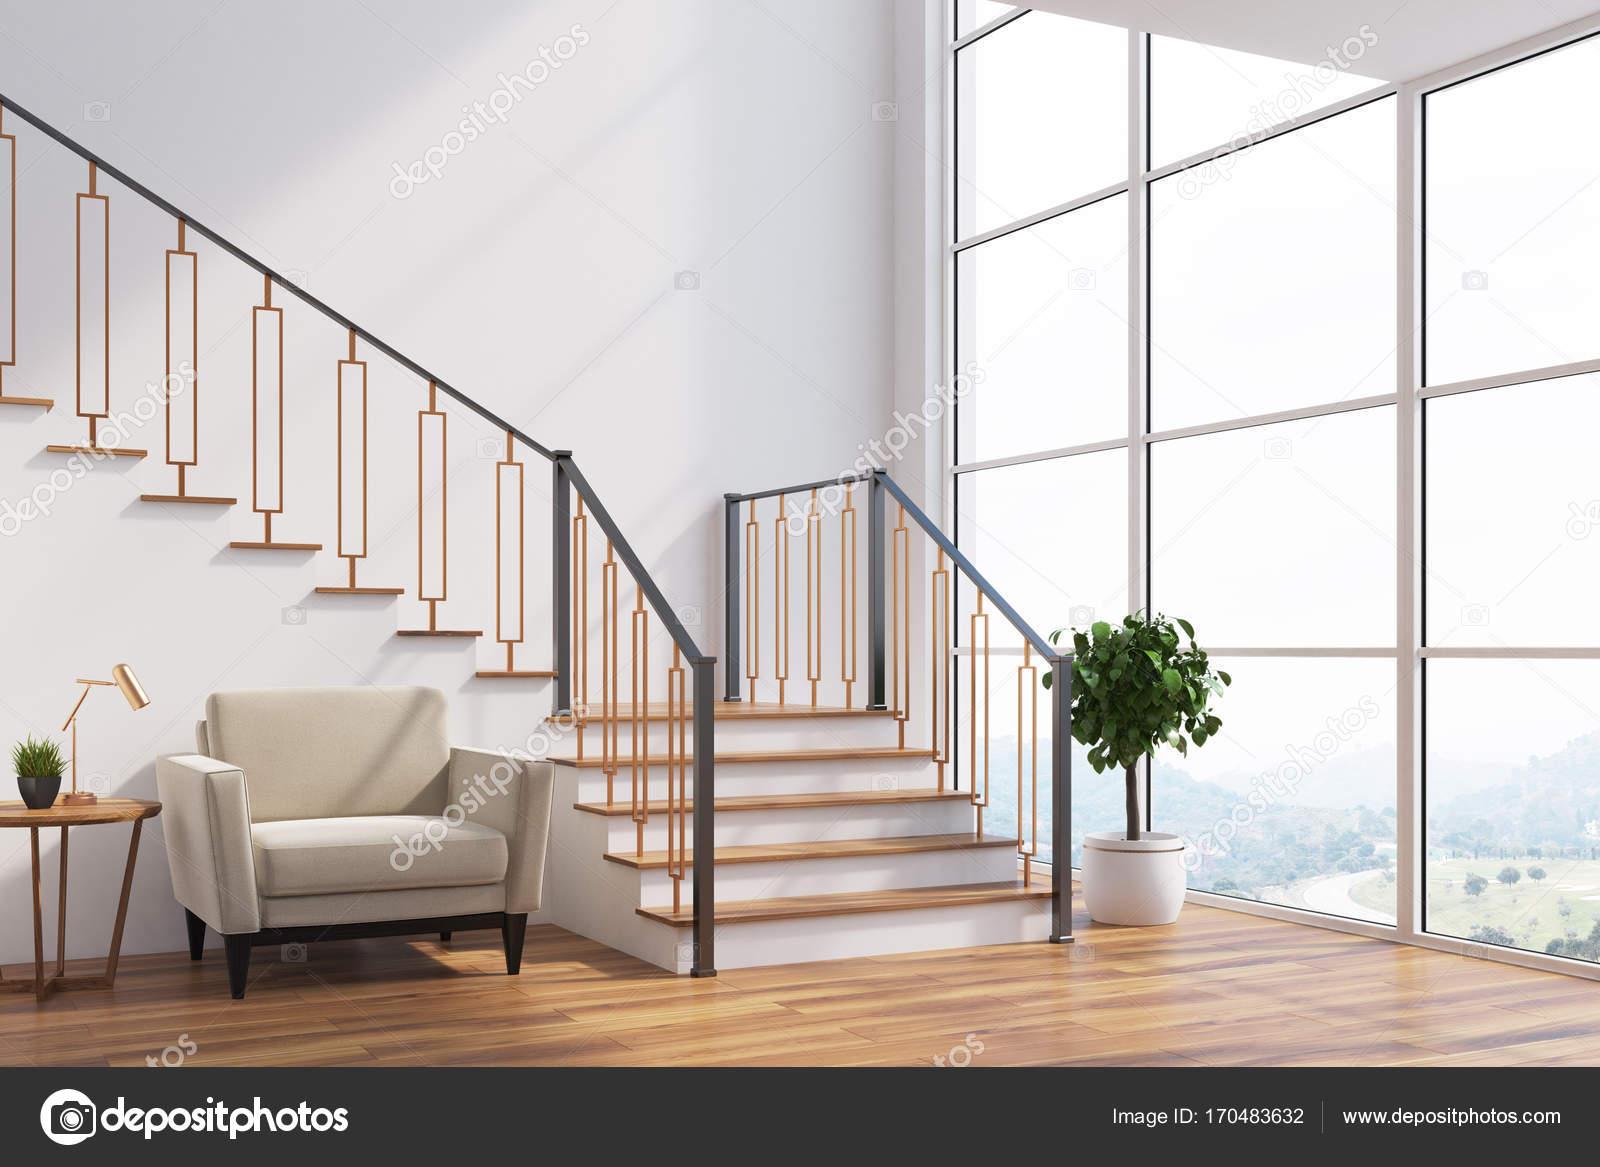 Trap In Woonkamer : Italiaanse klassieke woonkamer naast een houten trap royalty vrije